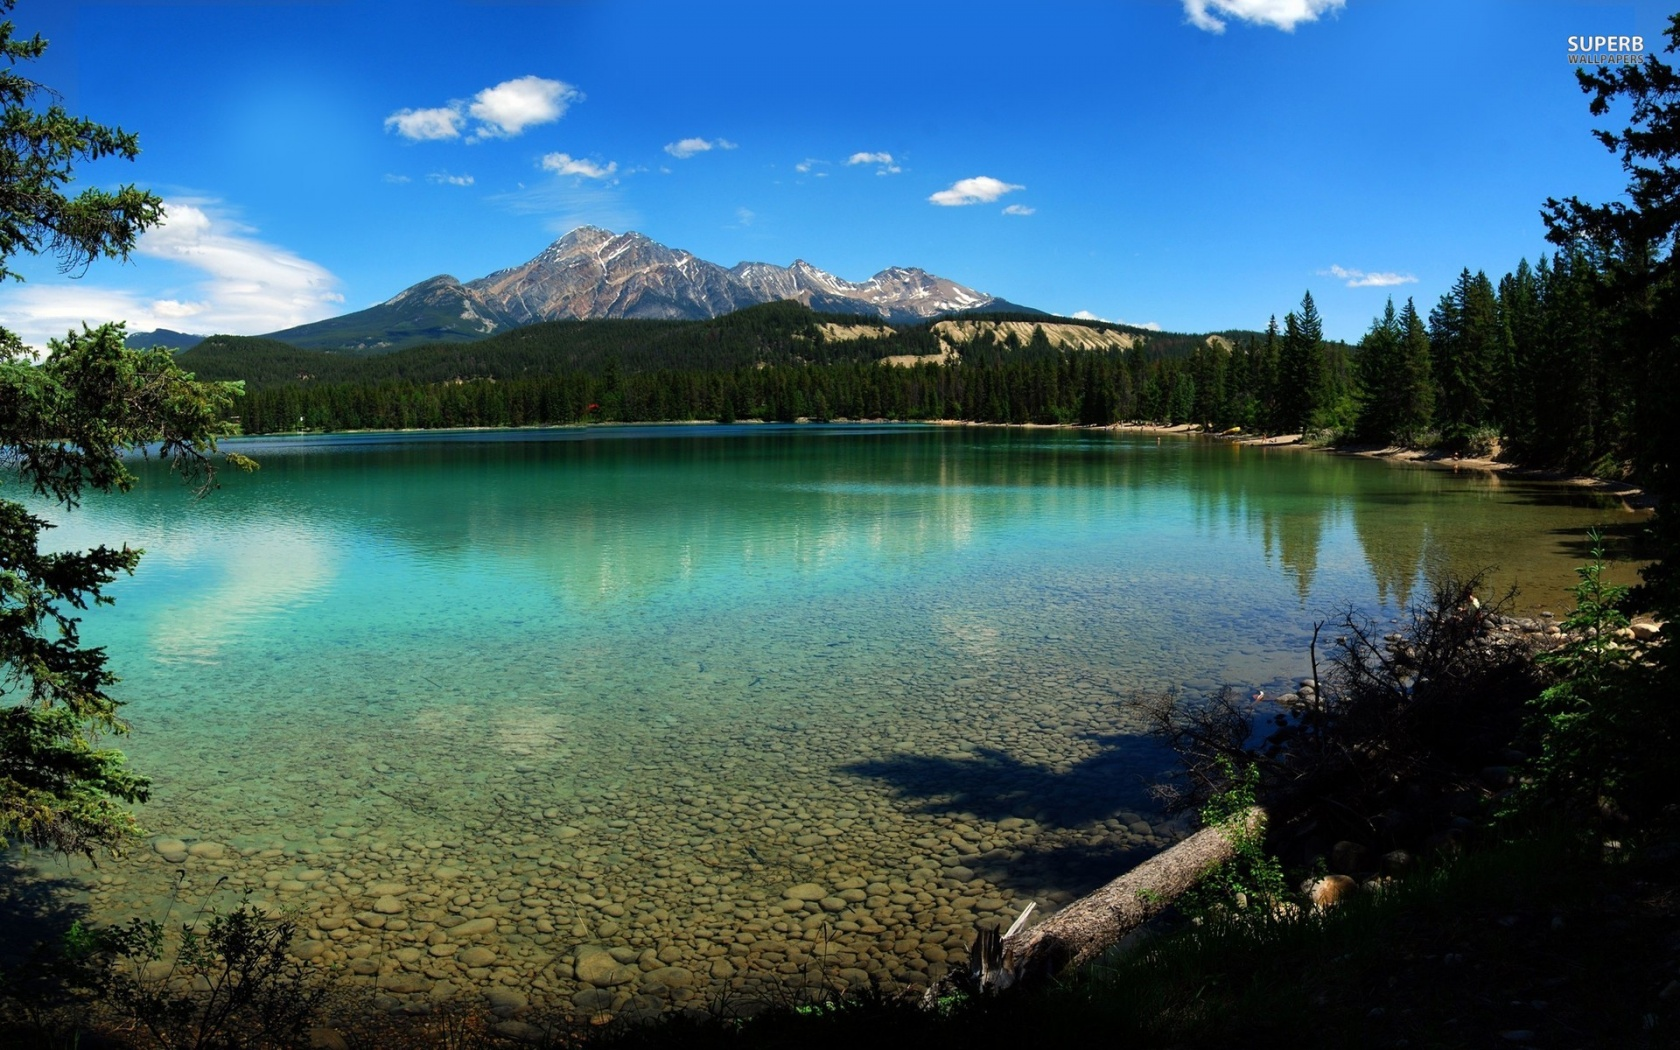 1680x1050 Jasper National Park desktop PC and Mac wallpaper 1680x1050